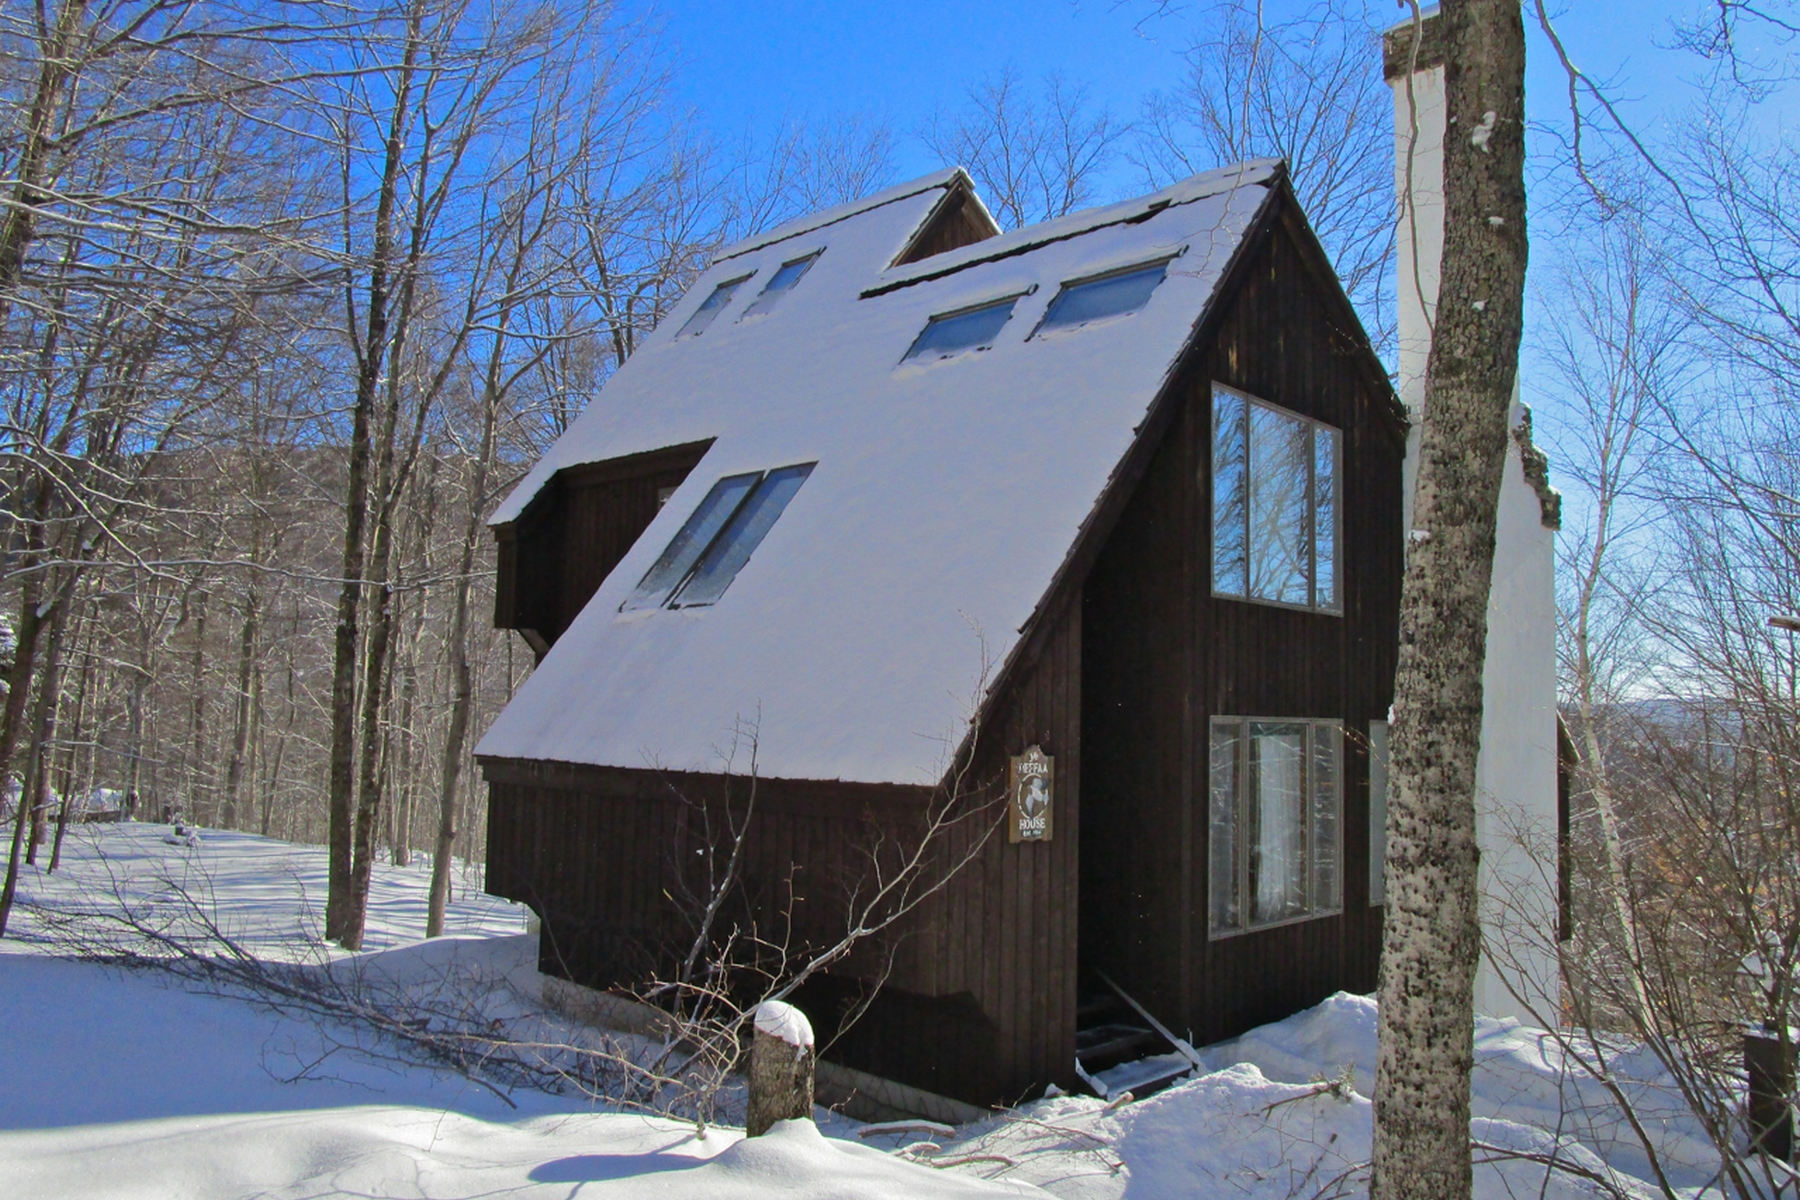 独户住宅 为 销售 在 Turnkey Home at Hawk Resort 84 Merlin Way 普利茅斯, 佛蒙特州, 05056 美国